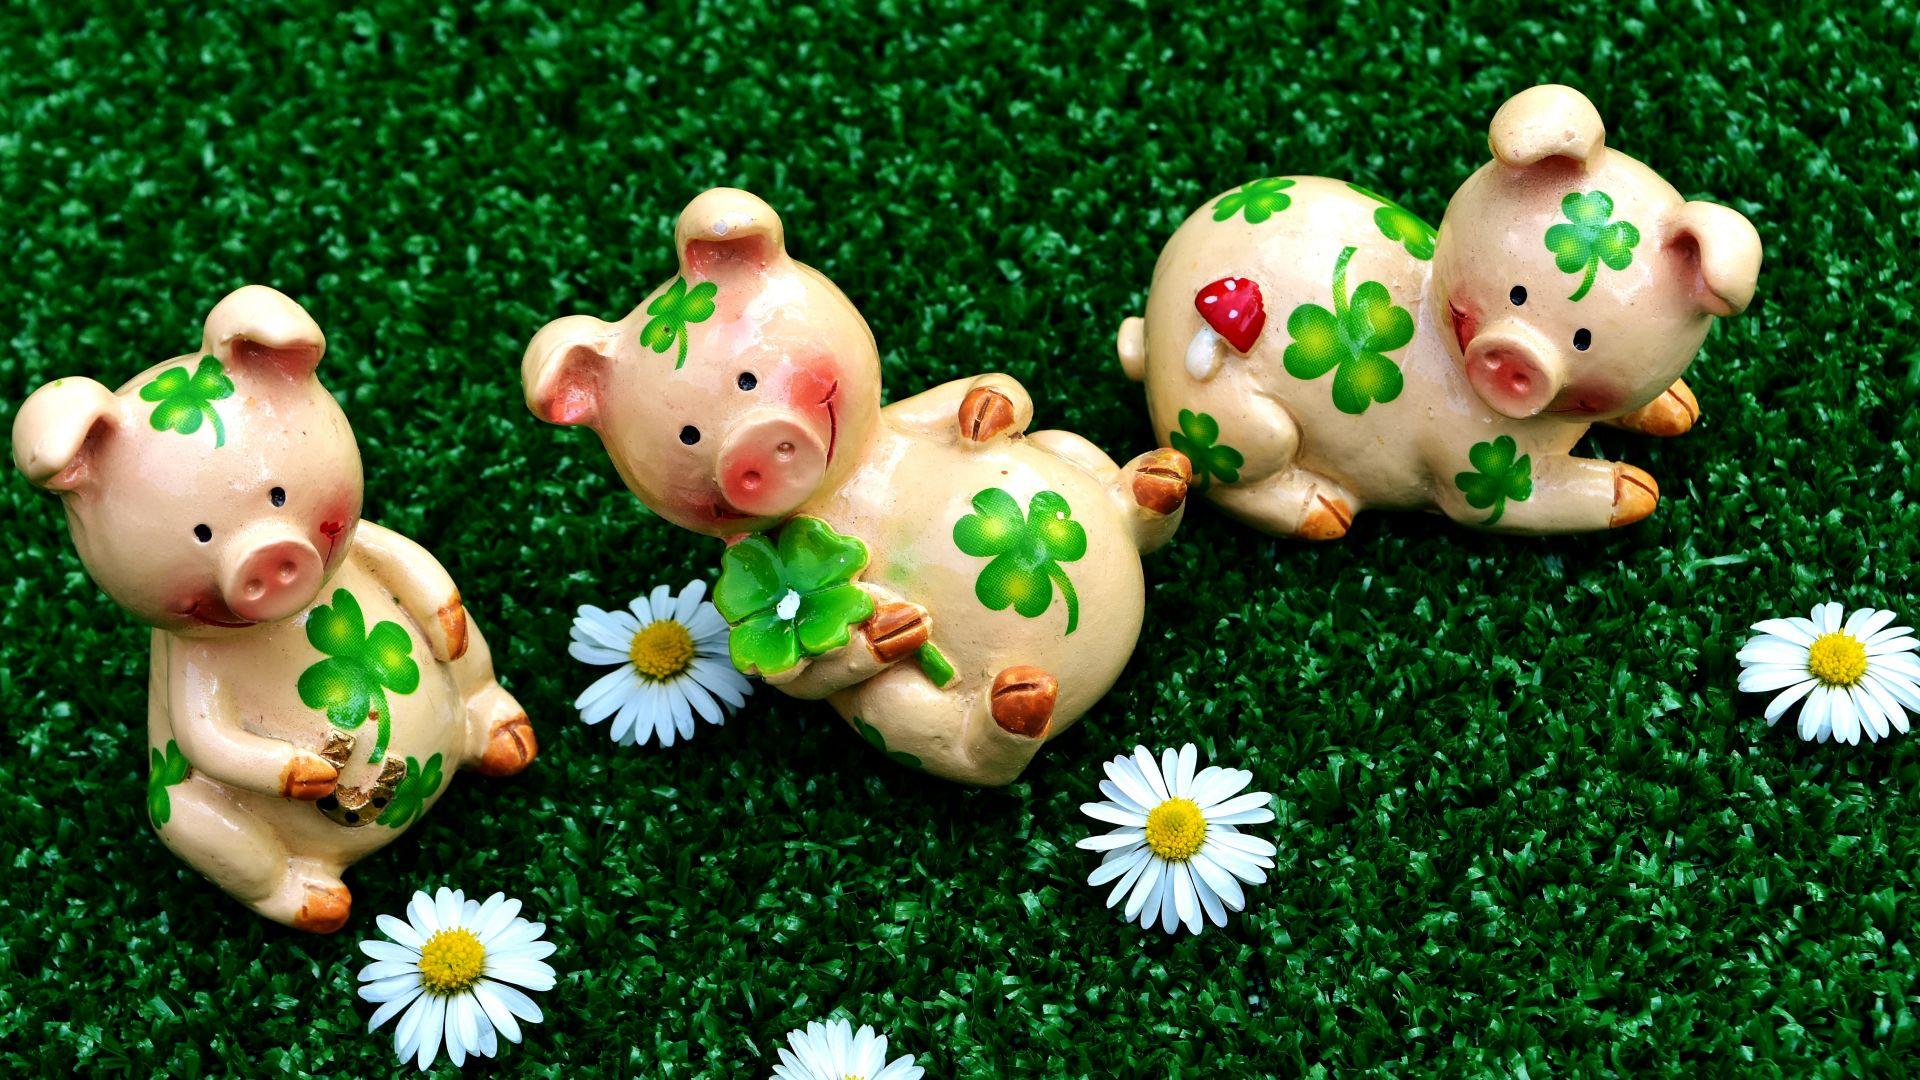 Wallpaper Pig figure, toys, daisy flowers, meadow